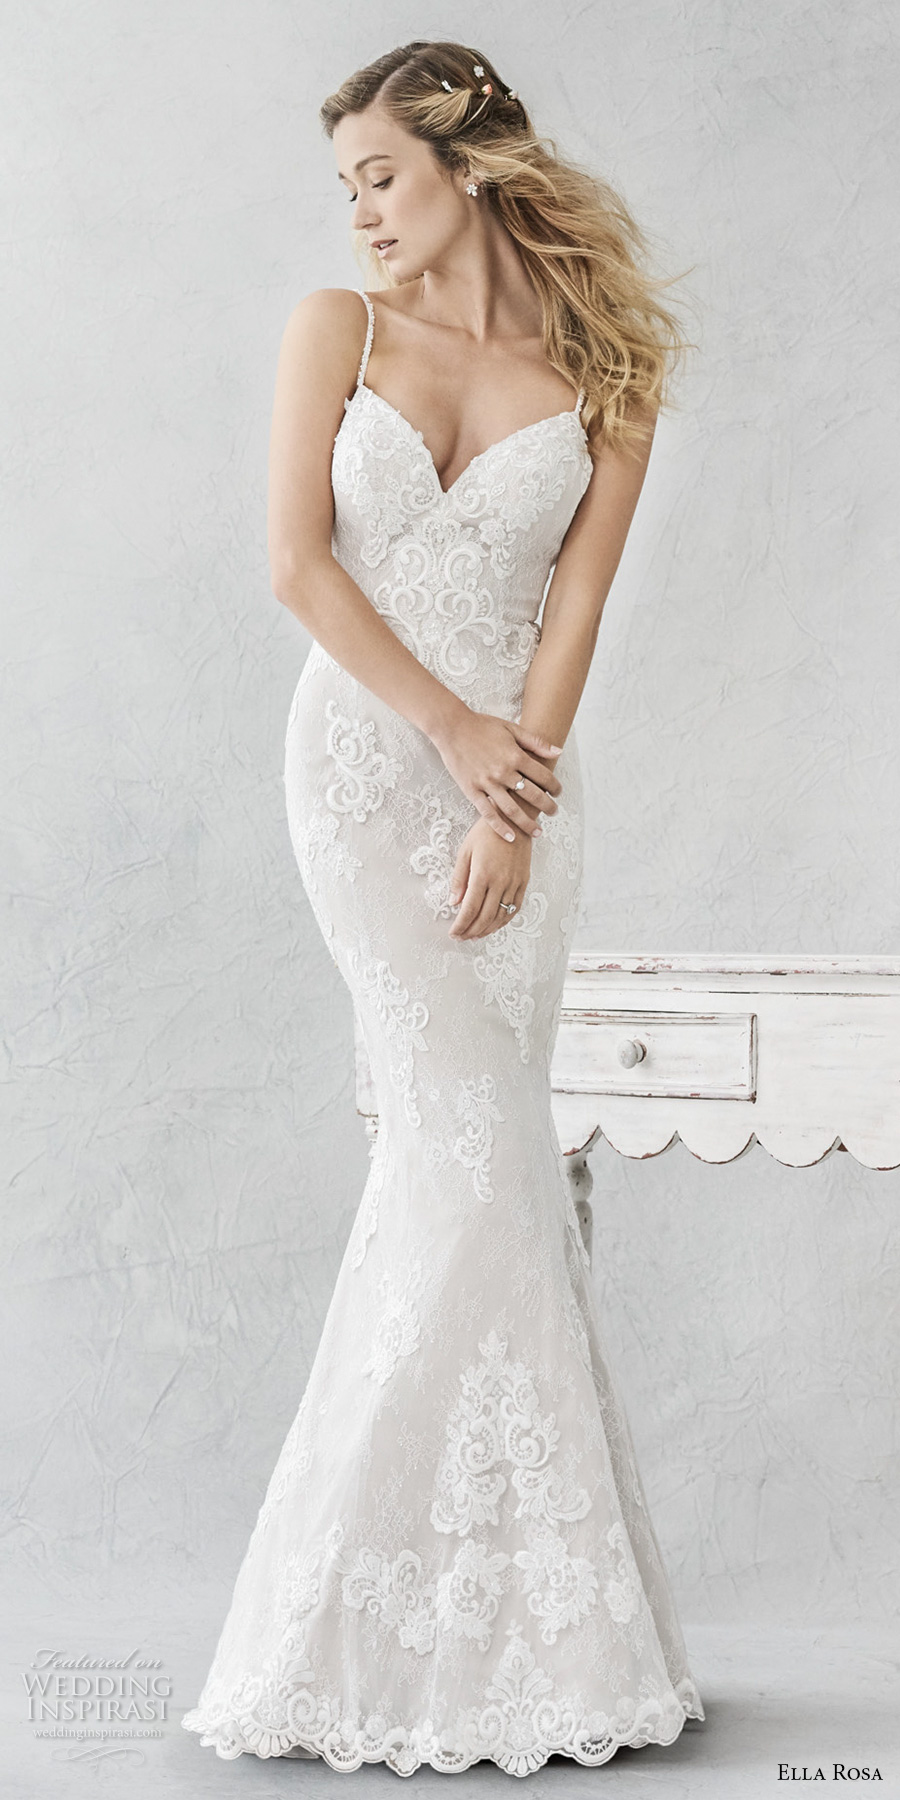 ella rosa spring 2017 bridal spagetti strap sweetheart neckline full embellishment romantic elegant fit and flare wedding dress open back sweep train (380) mv